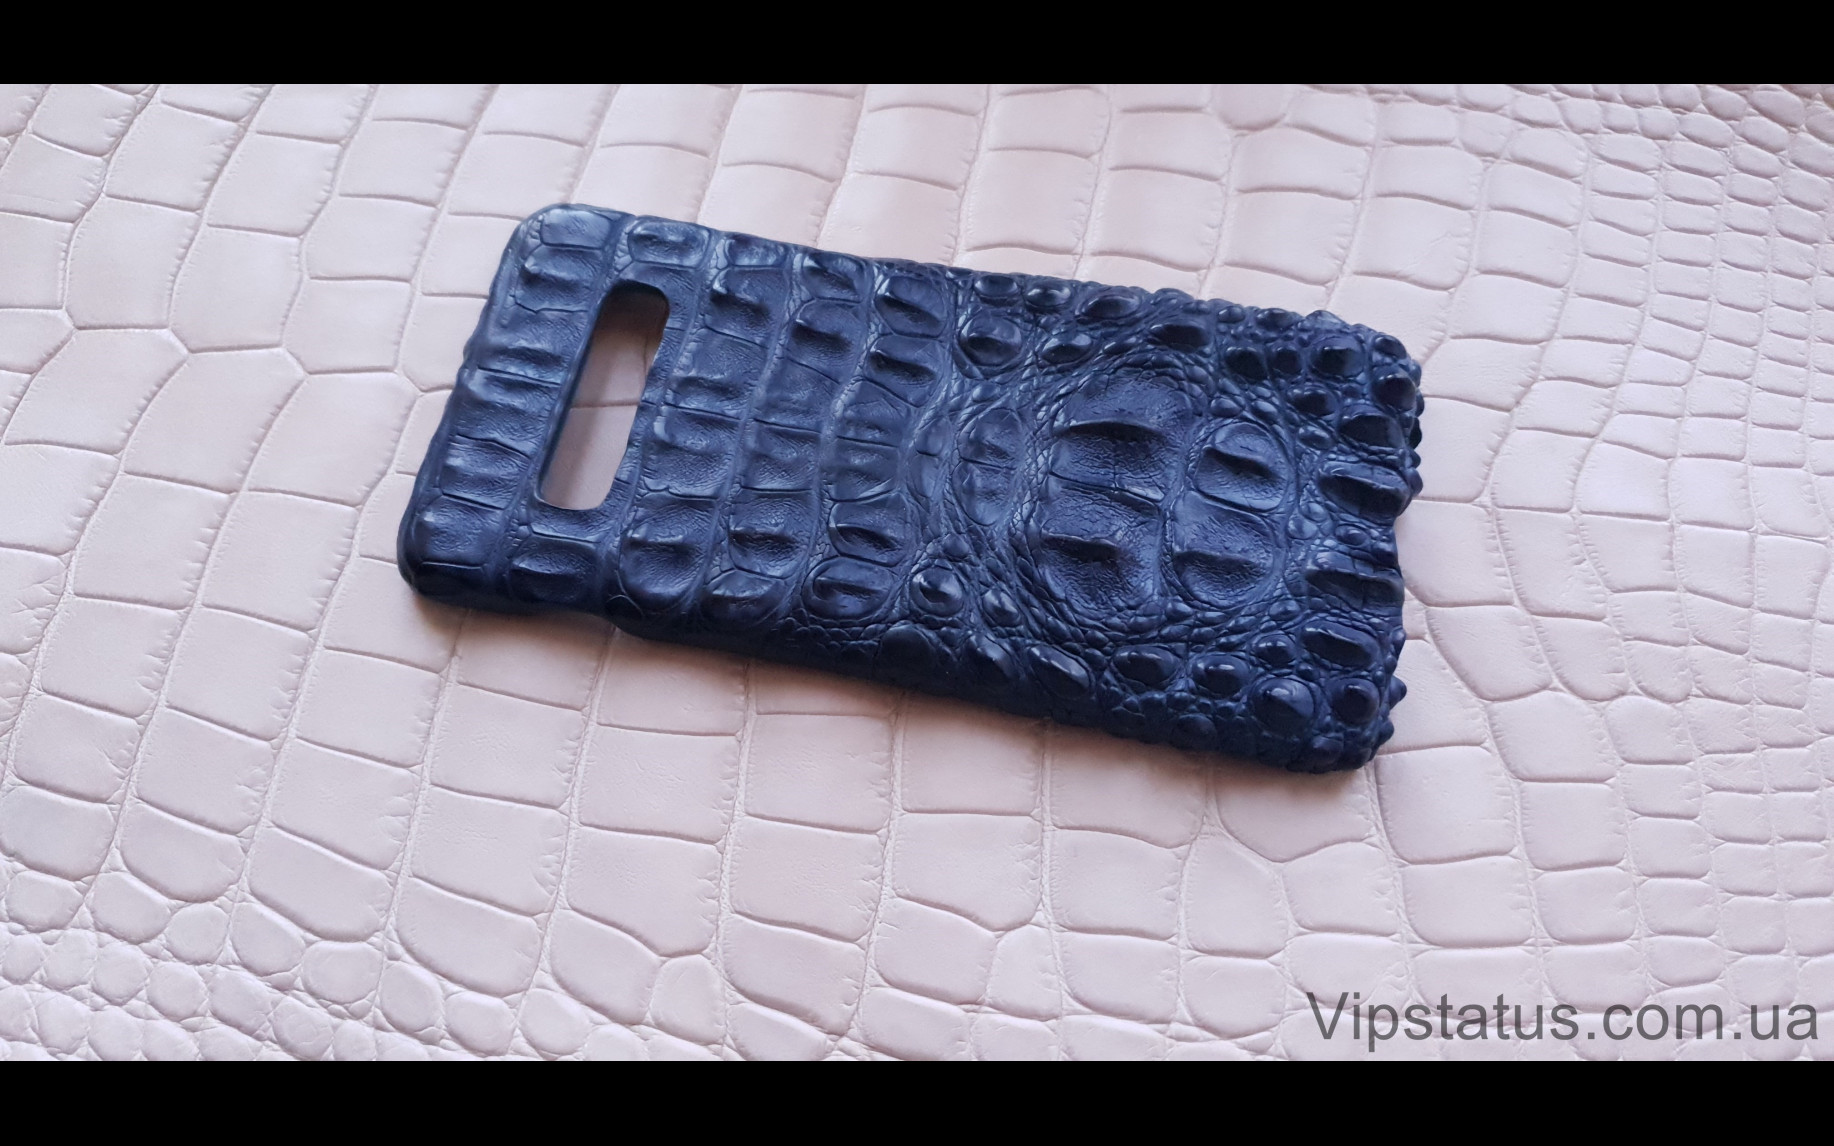 Elite Blue Crocodile Брутальный чехол Samsung S10 S20 S21 Plus Blue Crocodile Brutal case Samsung S10 S20 S21 Plus Crocodile leather image 1